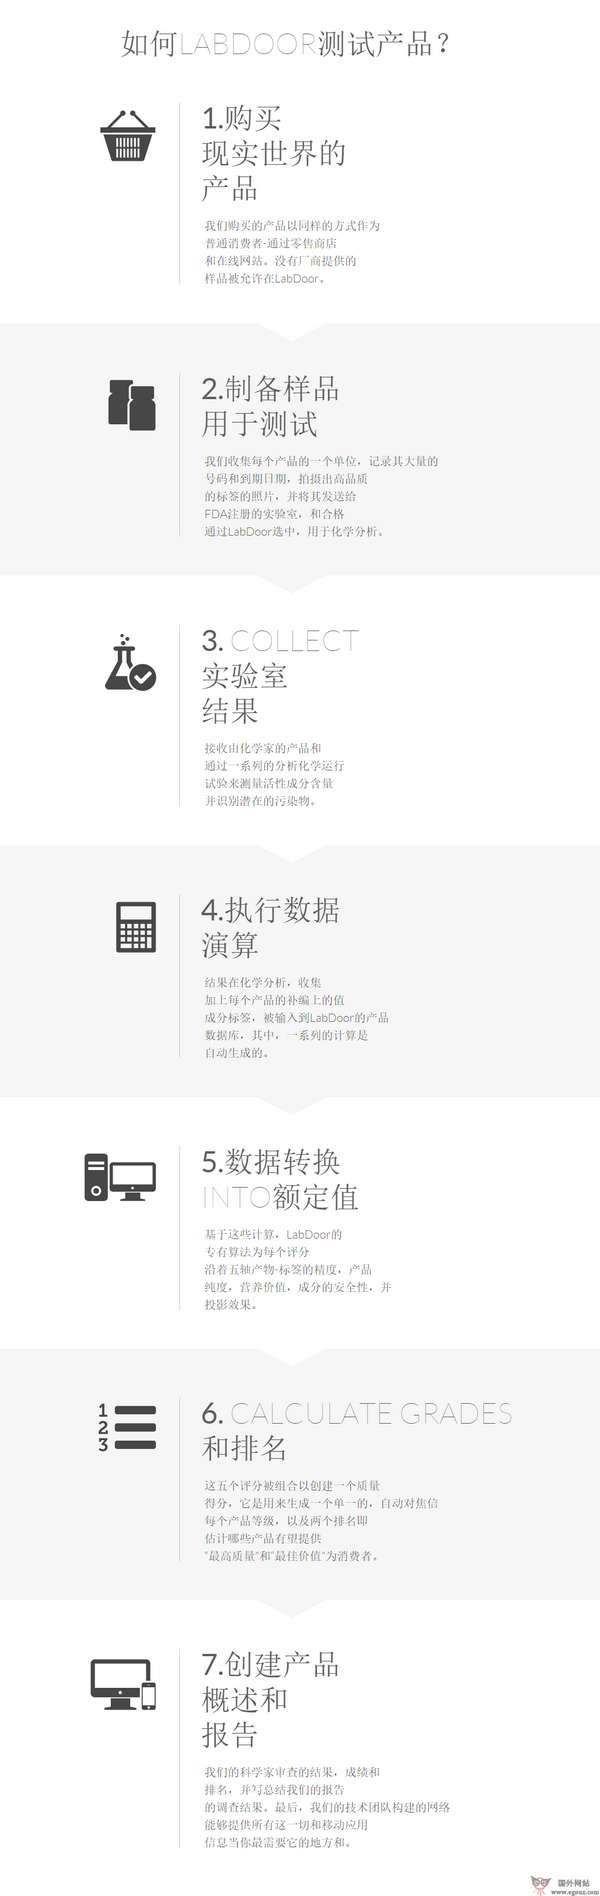 【经典网站】LabDoor:保健品试验评测网